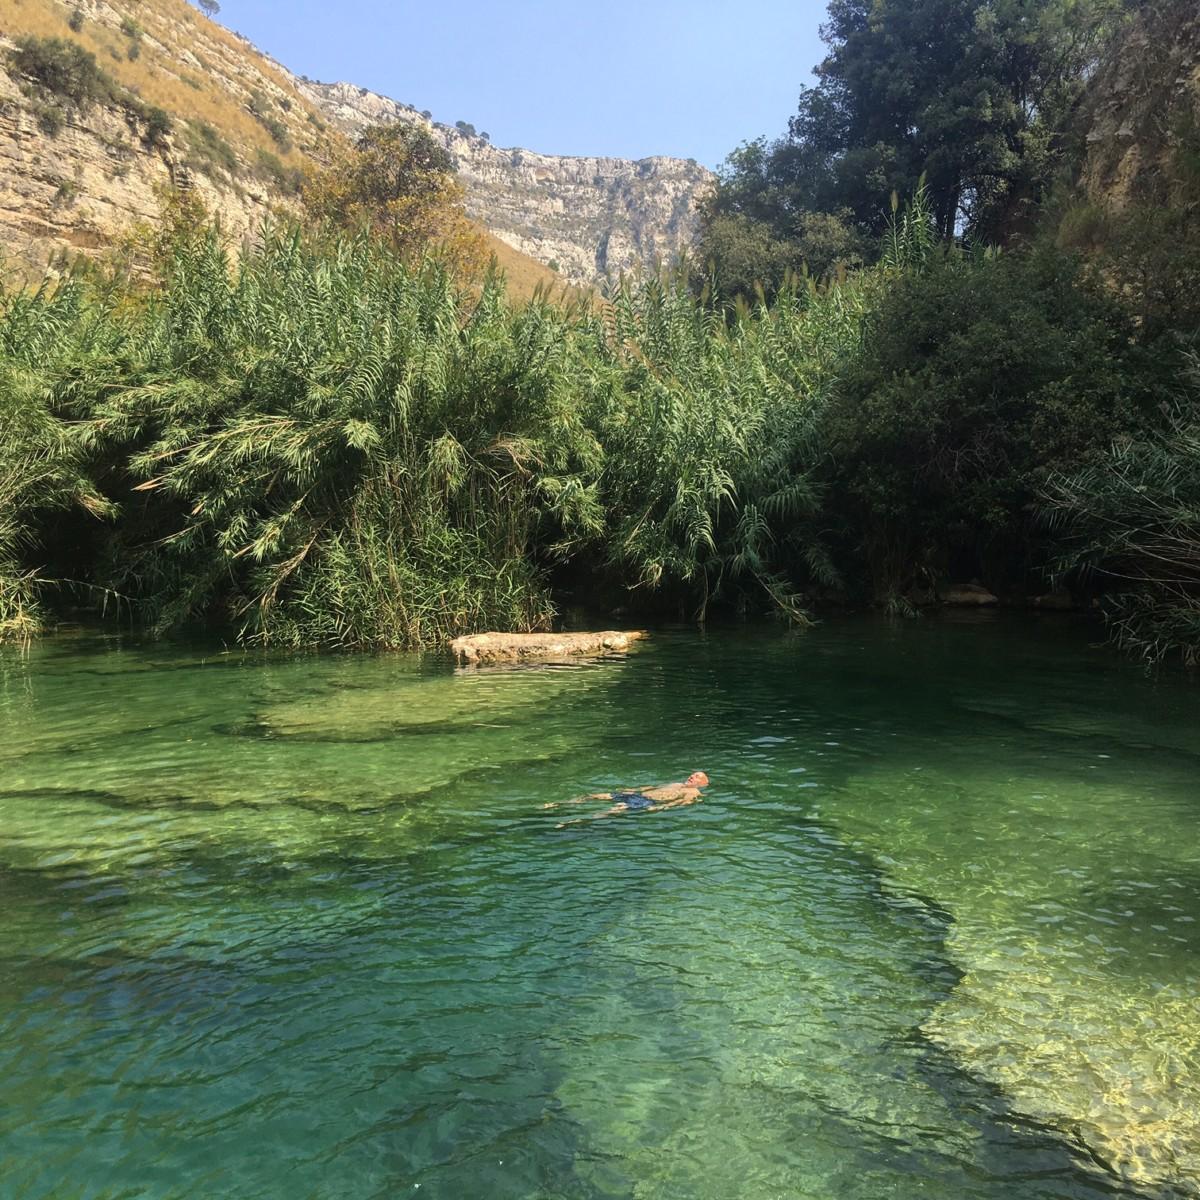 Cava Grande, Sicily with Seen by Solomon travel blog